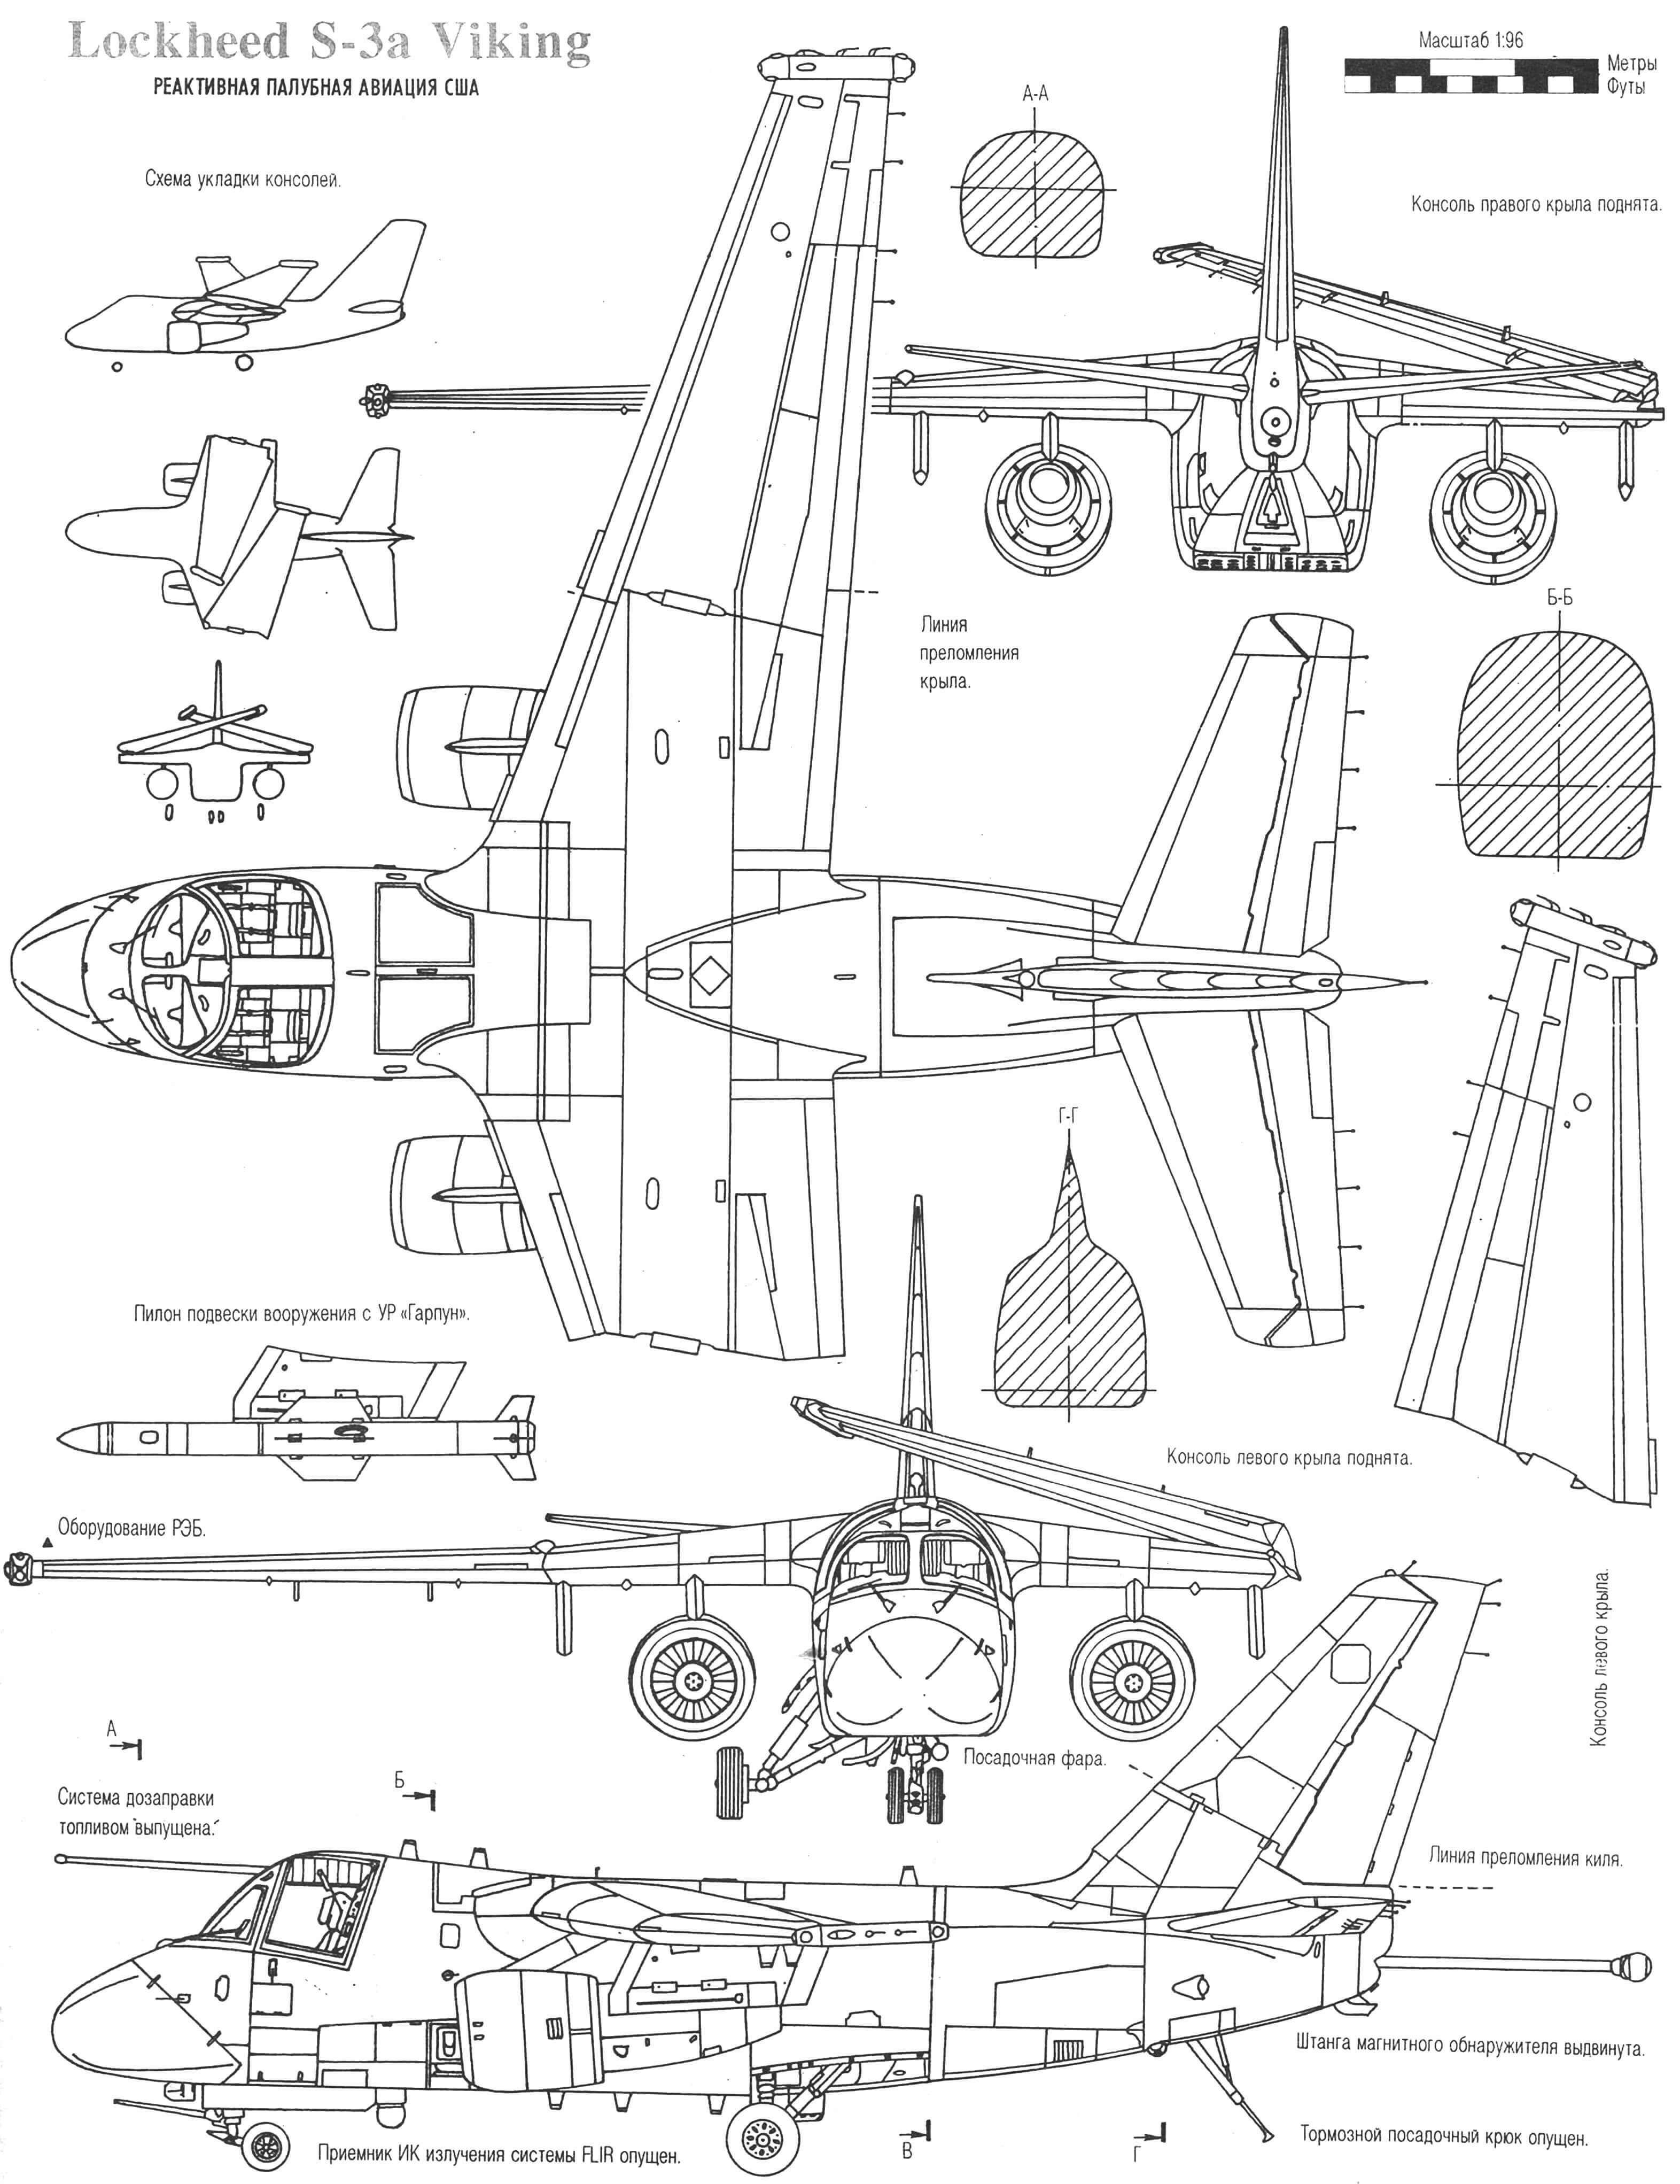 Lockheed S-За Viking